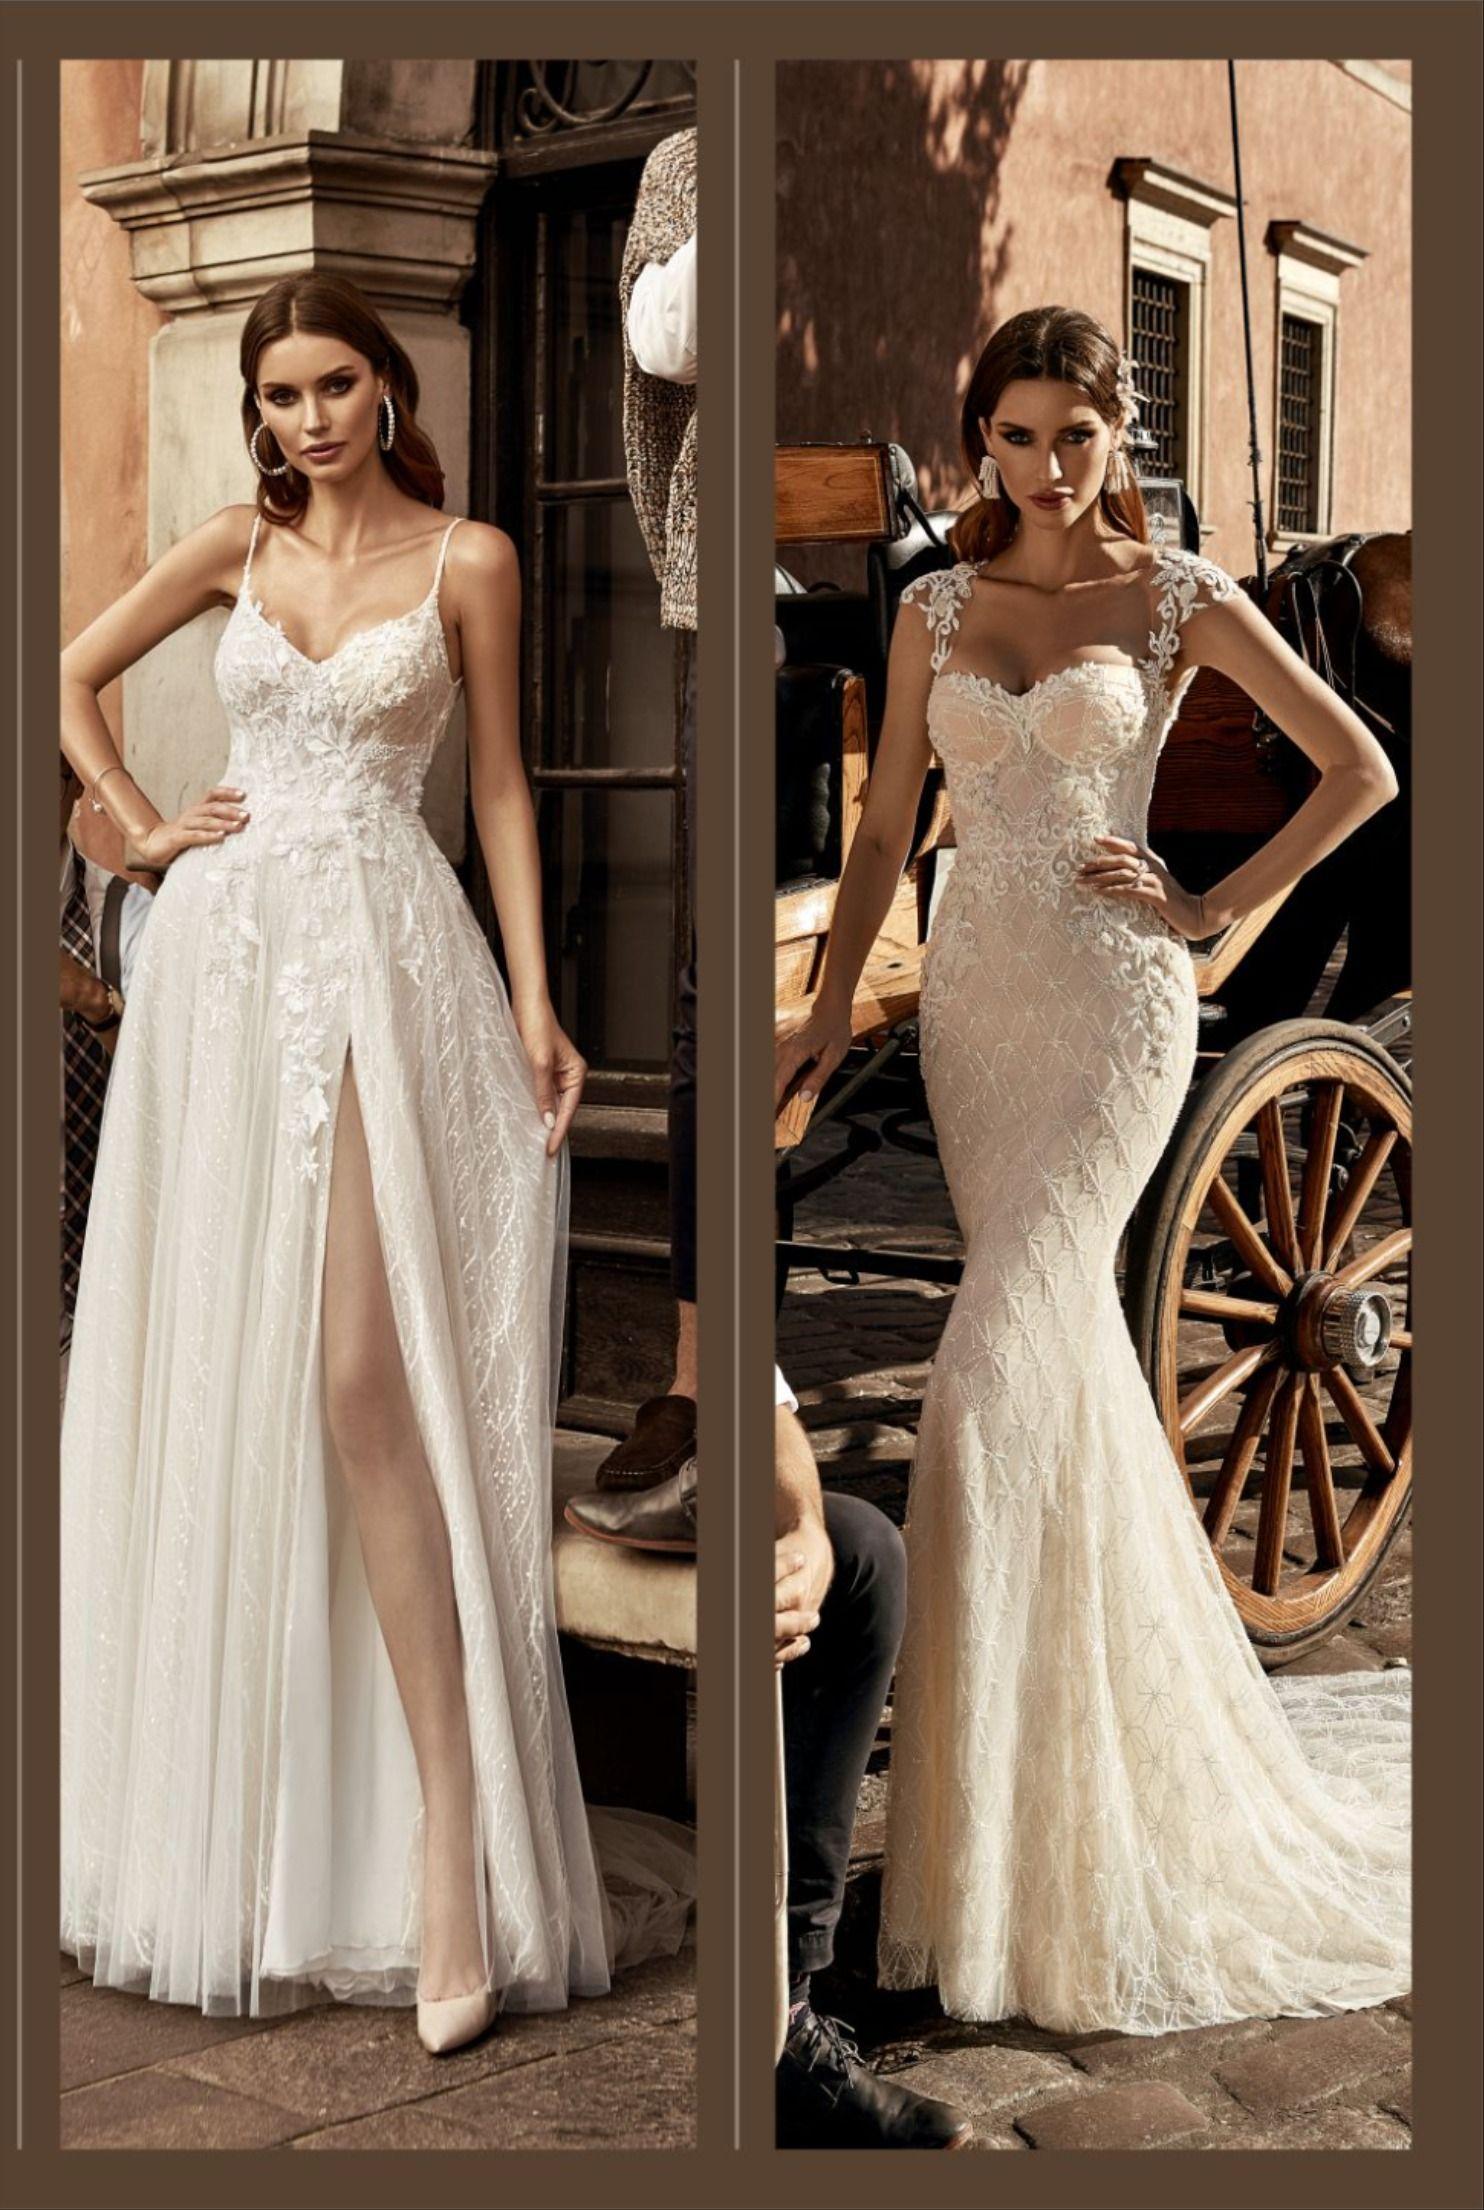 Wedding Dresses Jazz Muse Collection Jazz Dress Wedding Dresses Short Wedding Gowns [ 2210 x 1484 Pixel ]